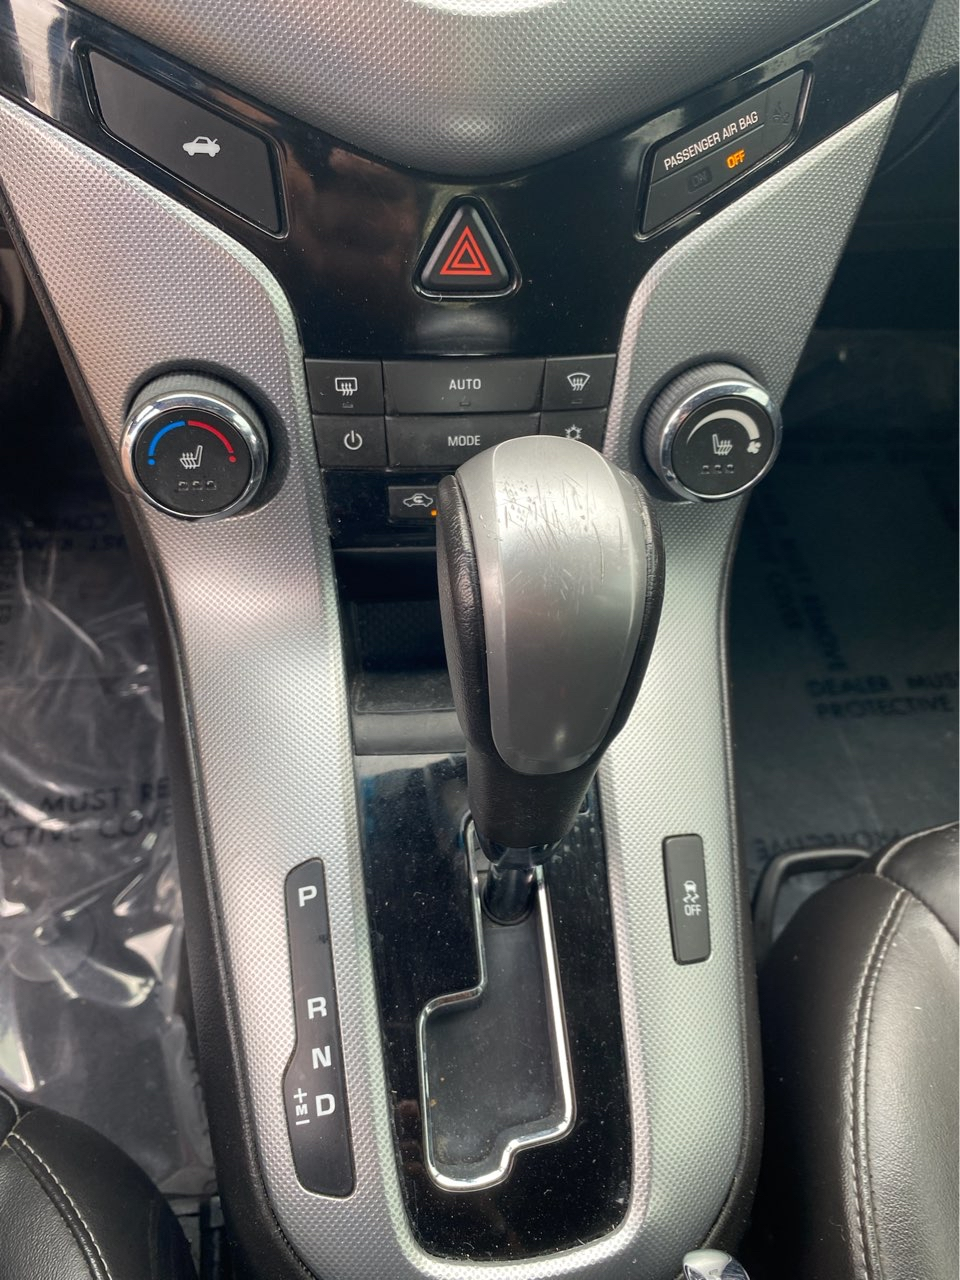 used vehicle - Sedan CHEVROLET CRUZE 2015